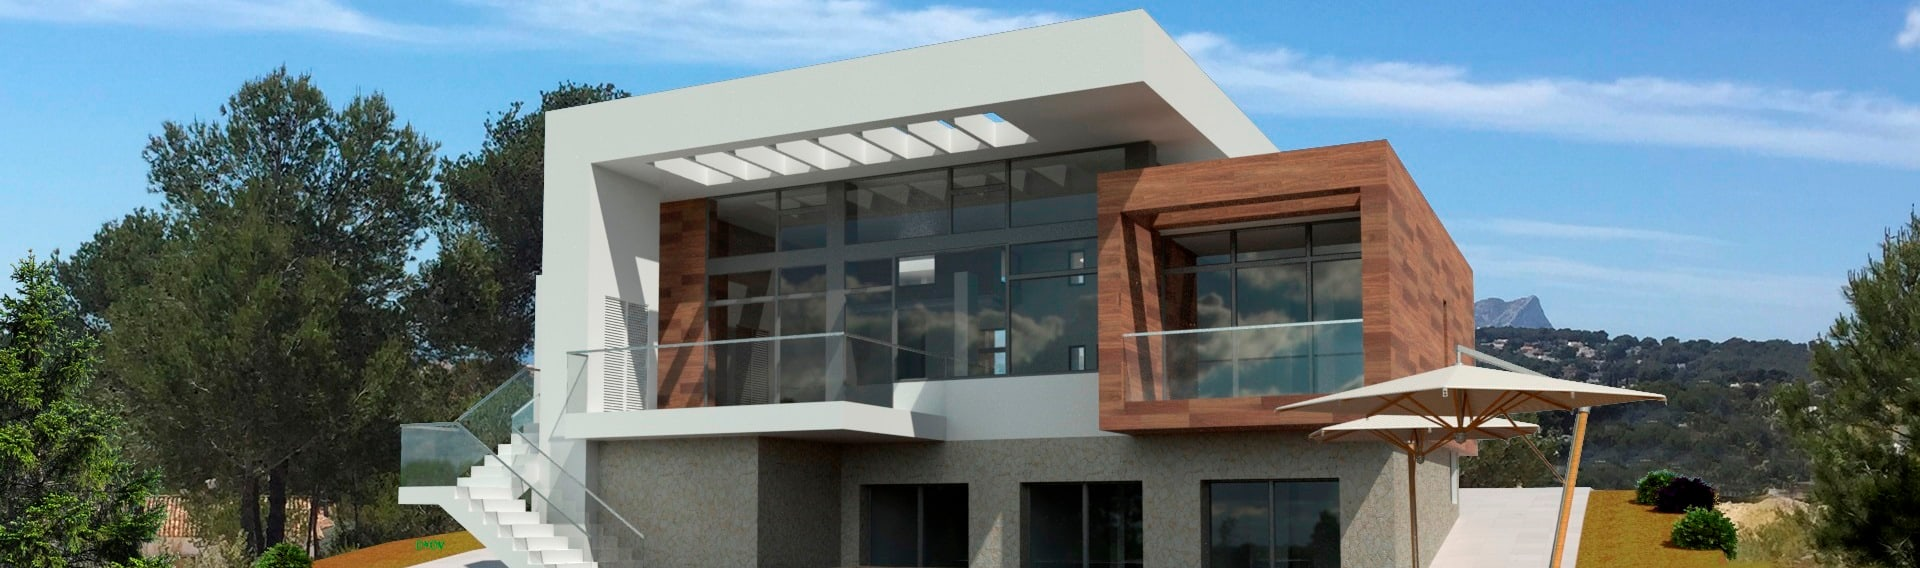 DYOV  STUDIO Arquitectura e Interiorismo  José Sánchez Vélez. 653773806